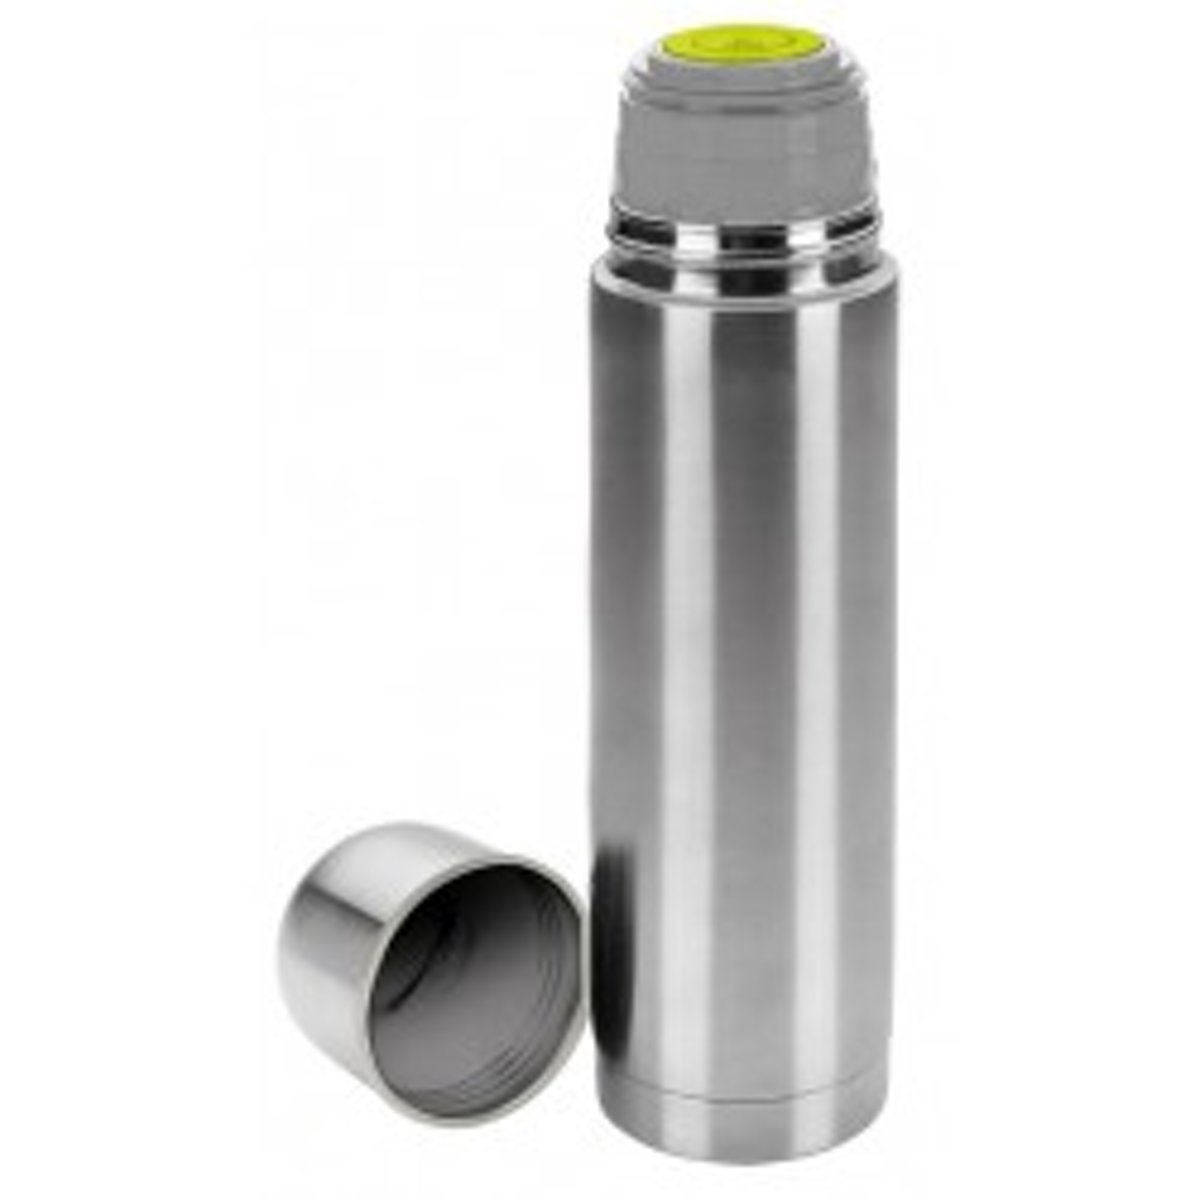 Dubbelwandige inox thermosfles 500ml kopen